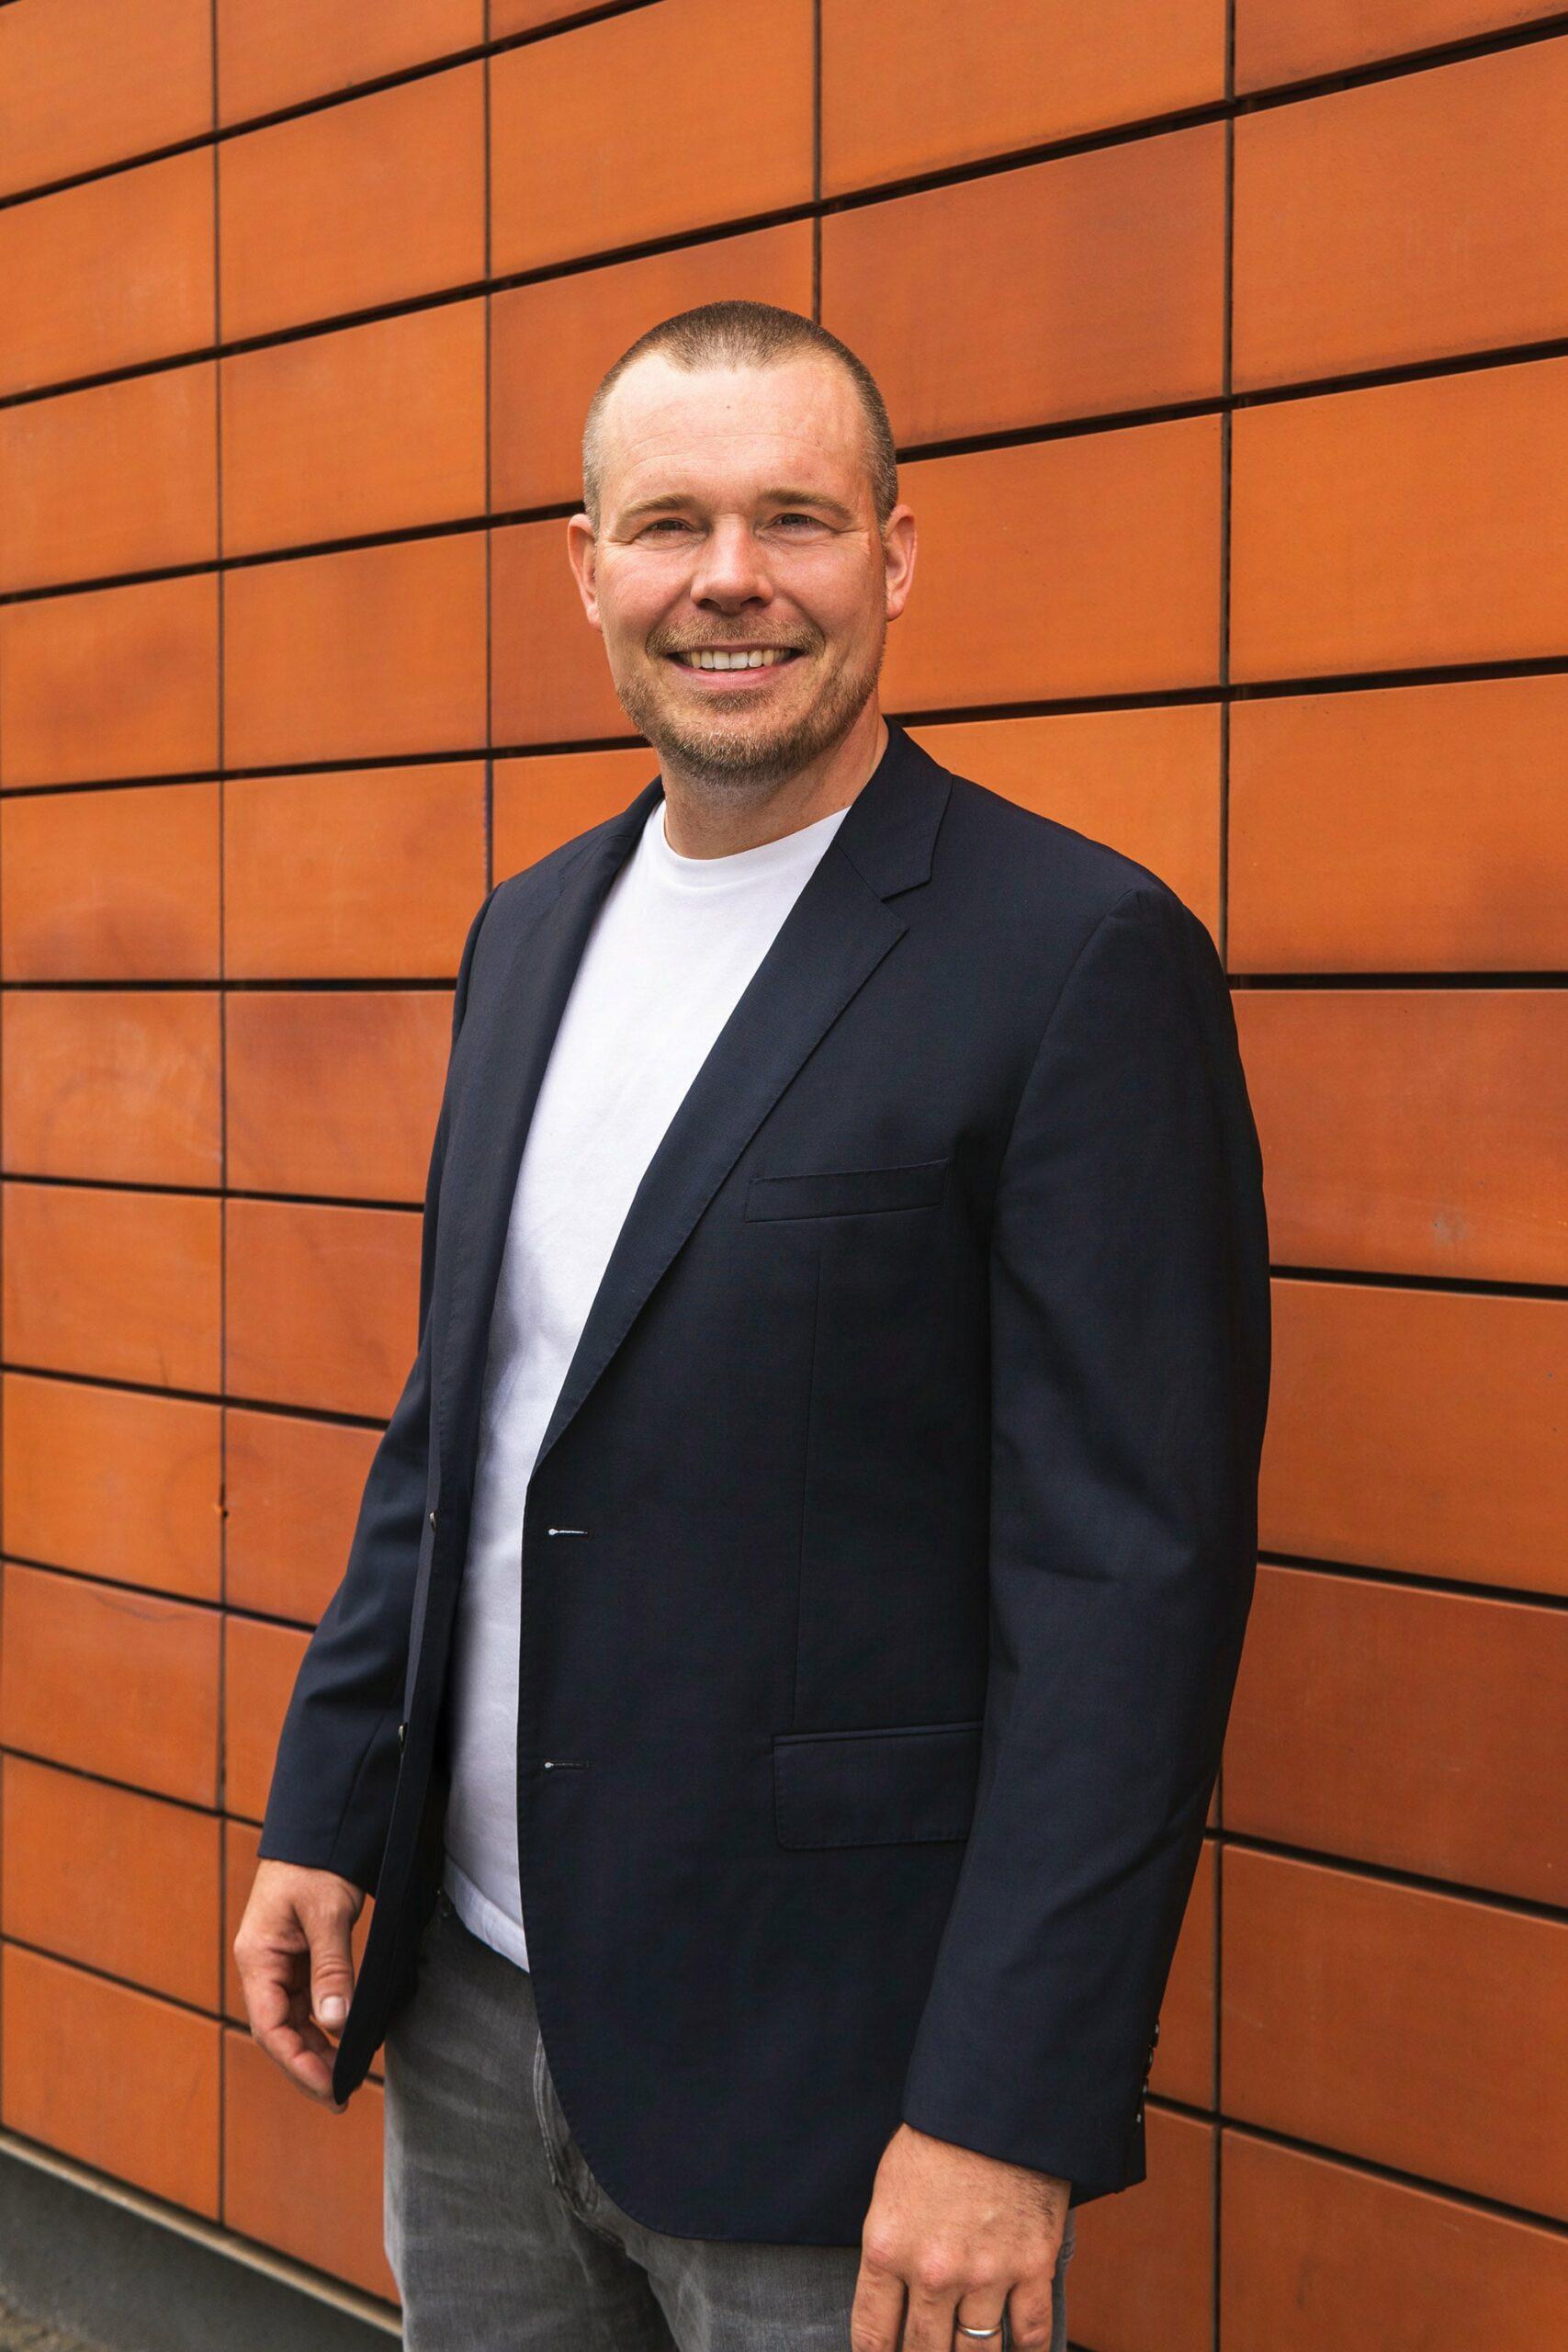 Simon Baring nextbike Senior Business Development Manager Media & Services